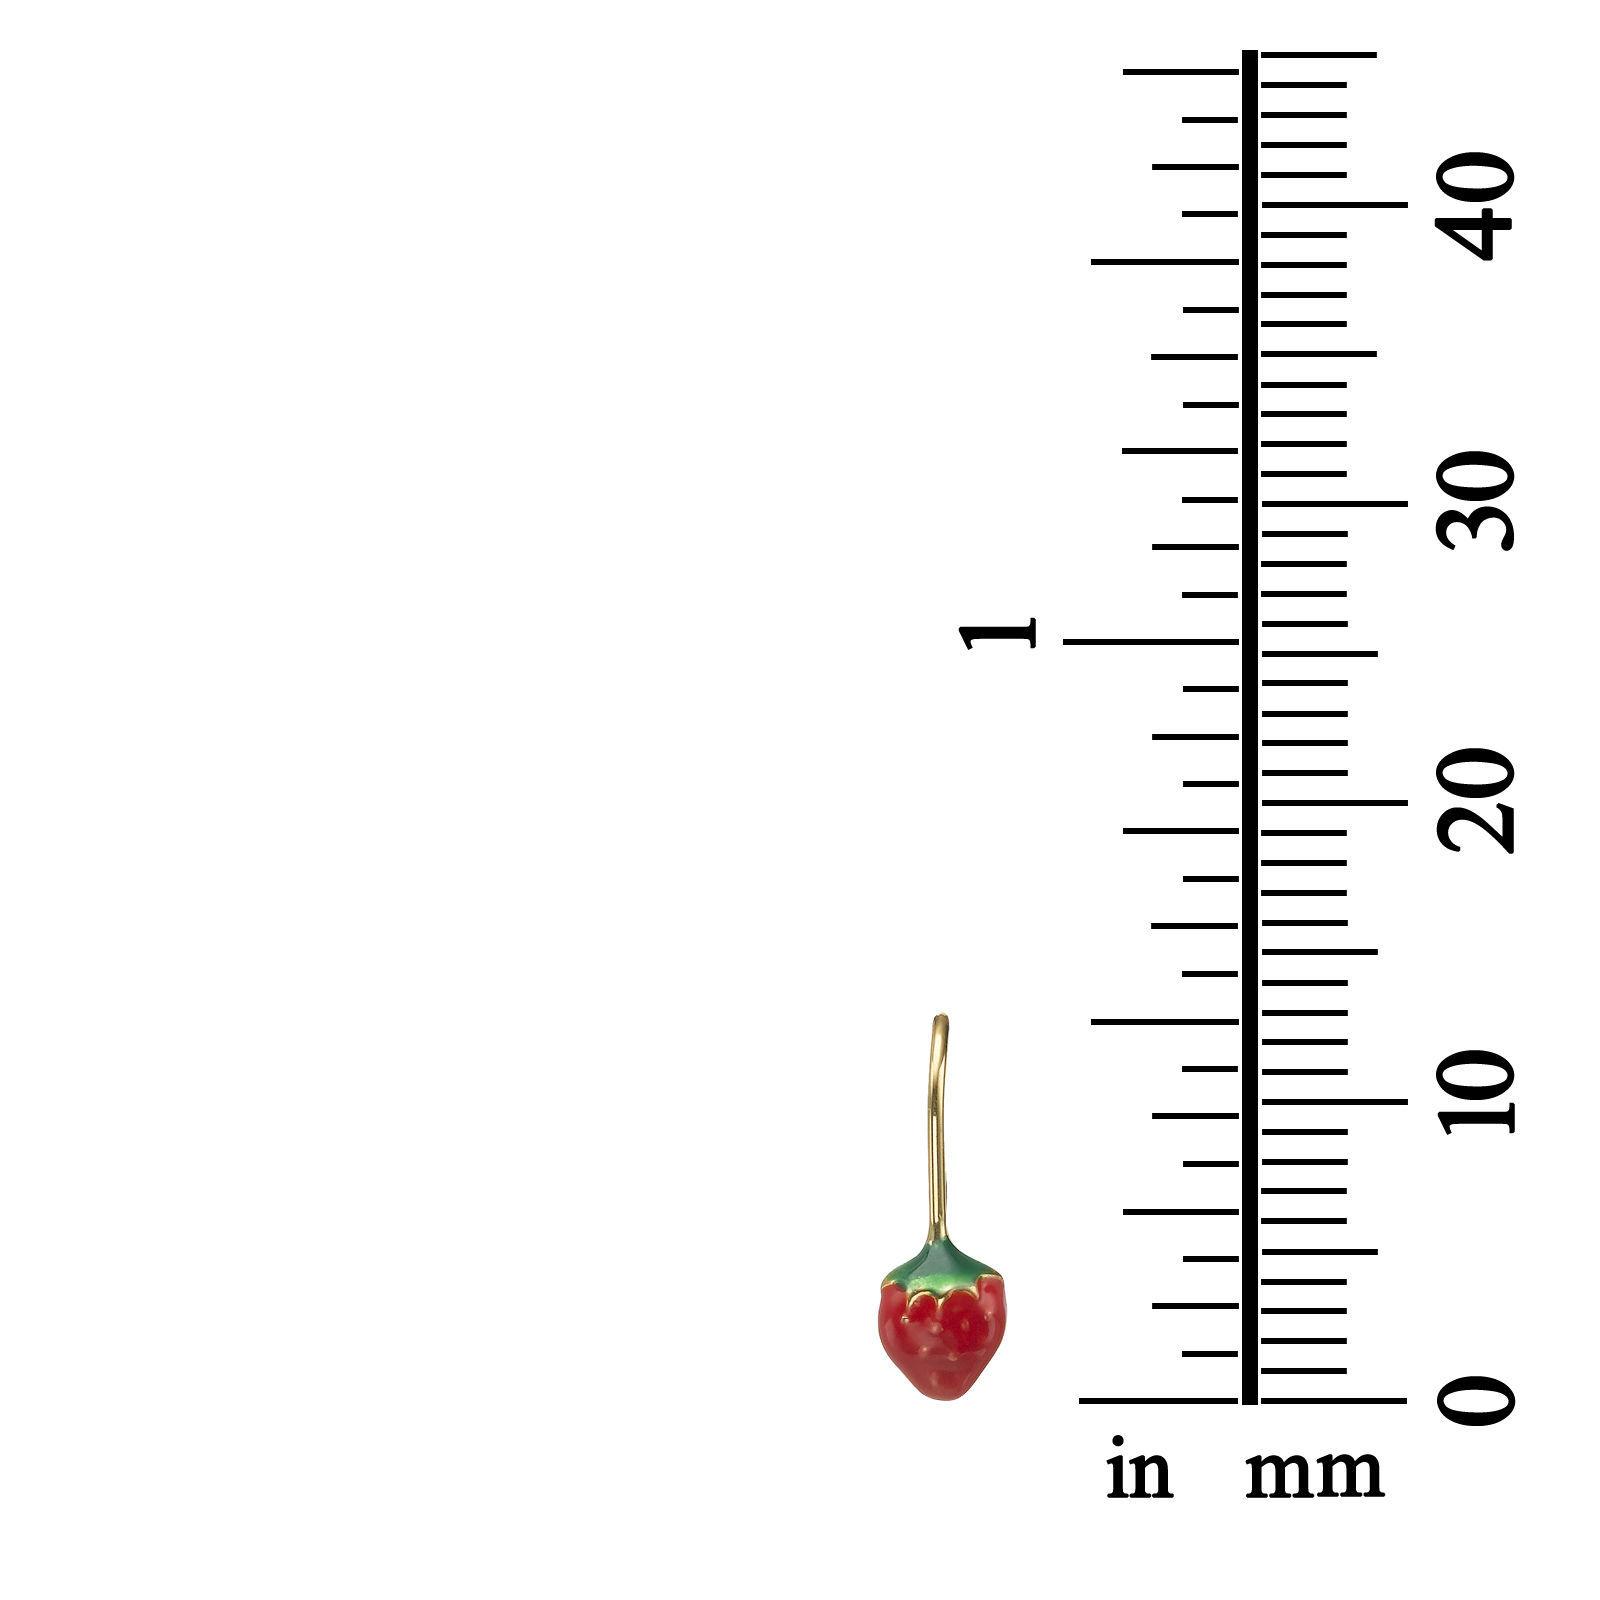 14k Solid Yellow Gold Eliptical Hoop Earrings Strawberry